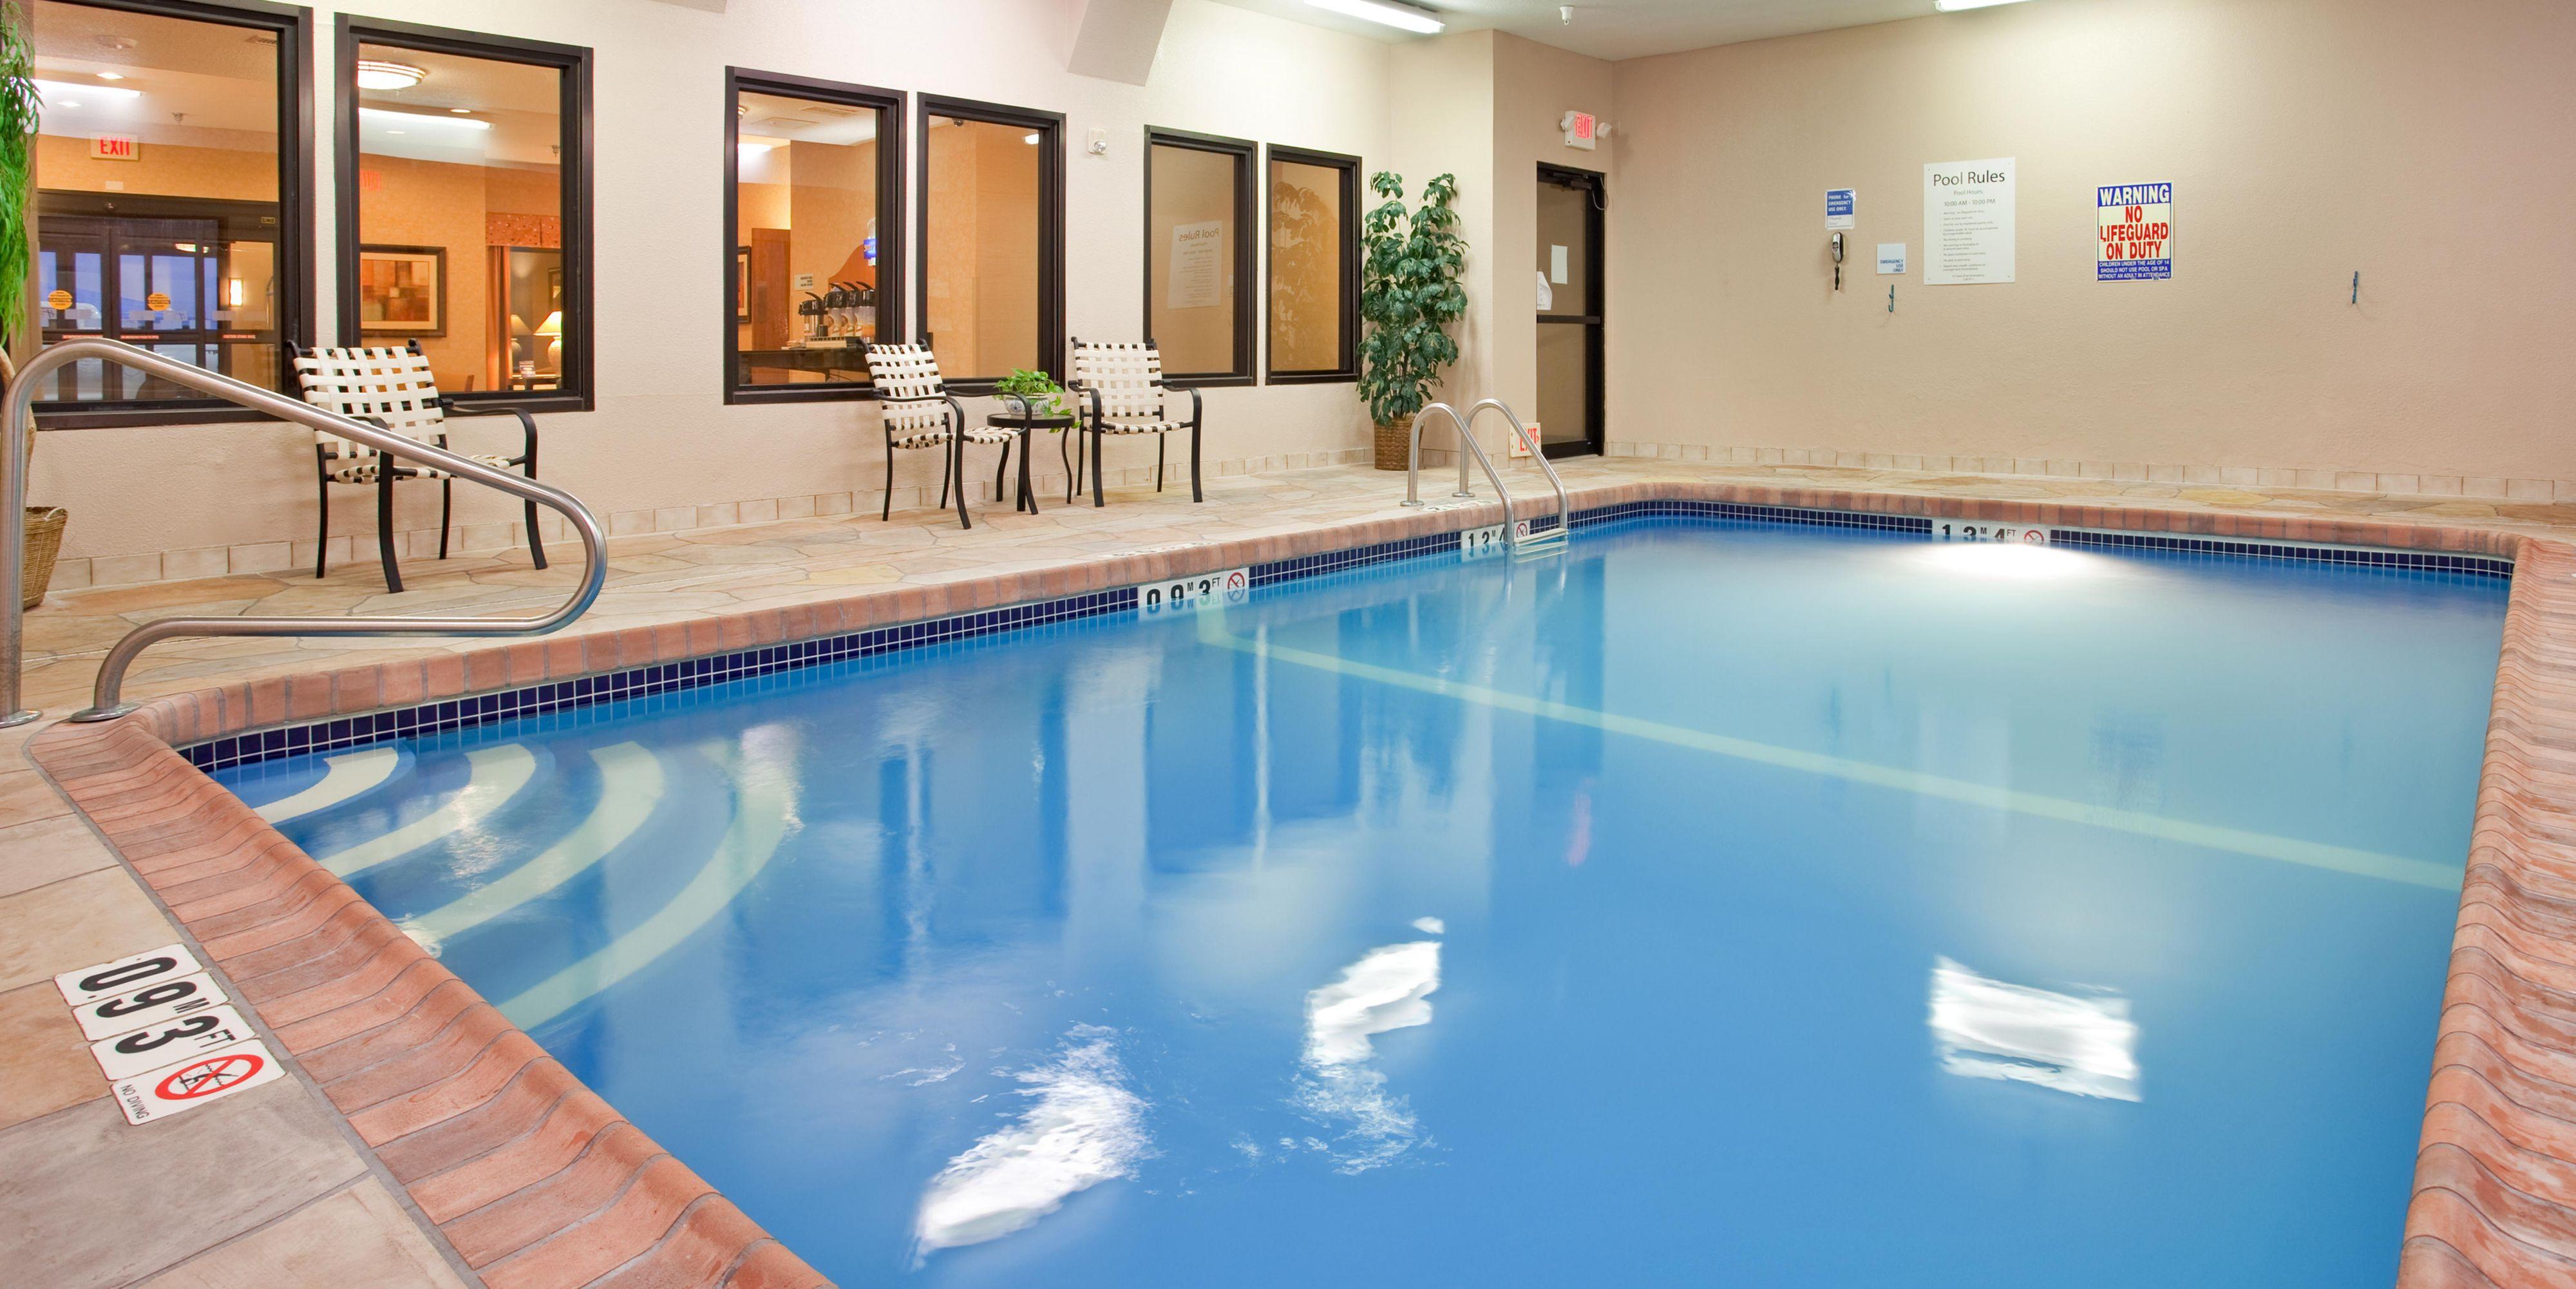 Holiday Inn Express Suites Kansas City Liberty Hwy 152 Hotel By Ihg